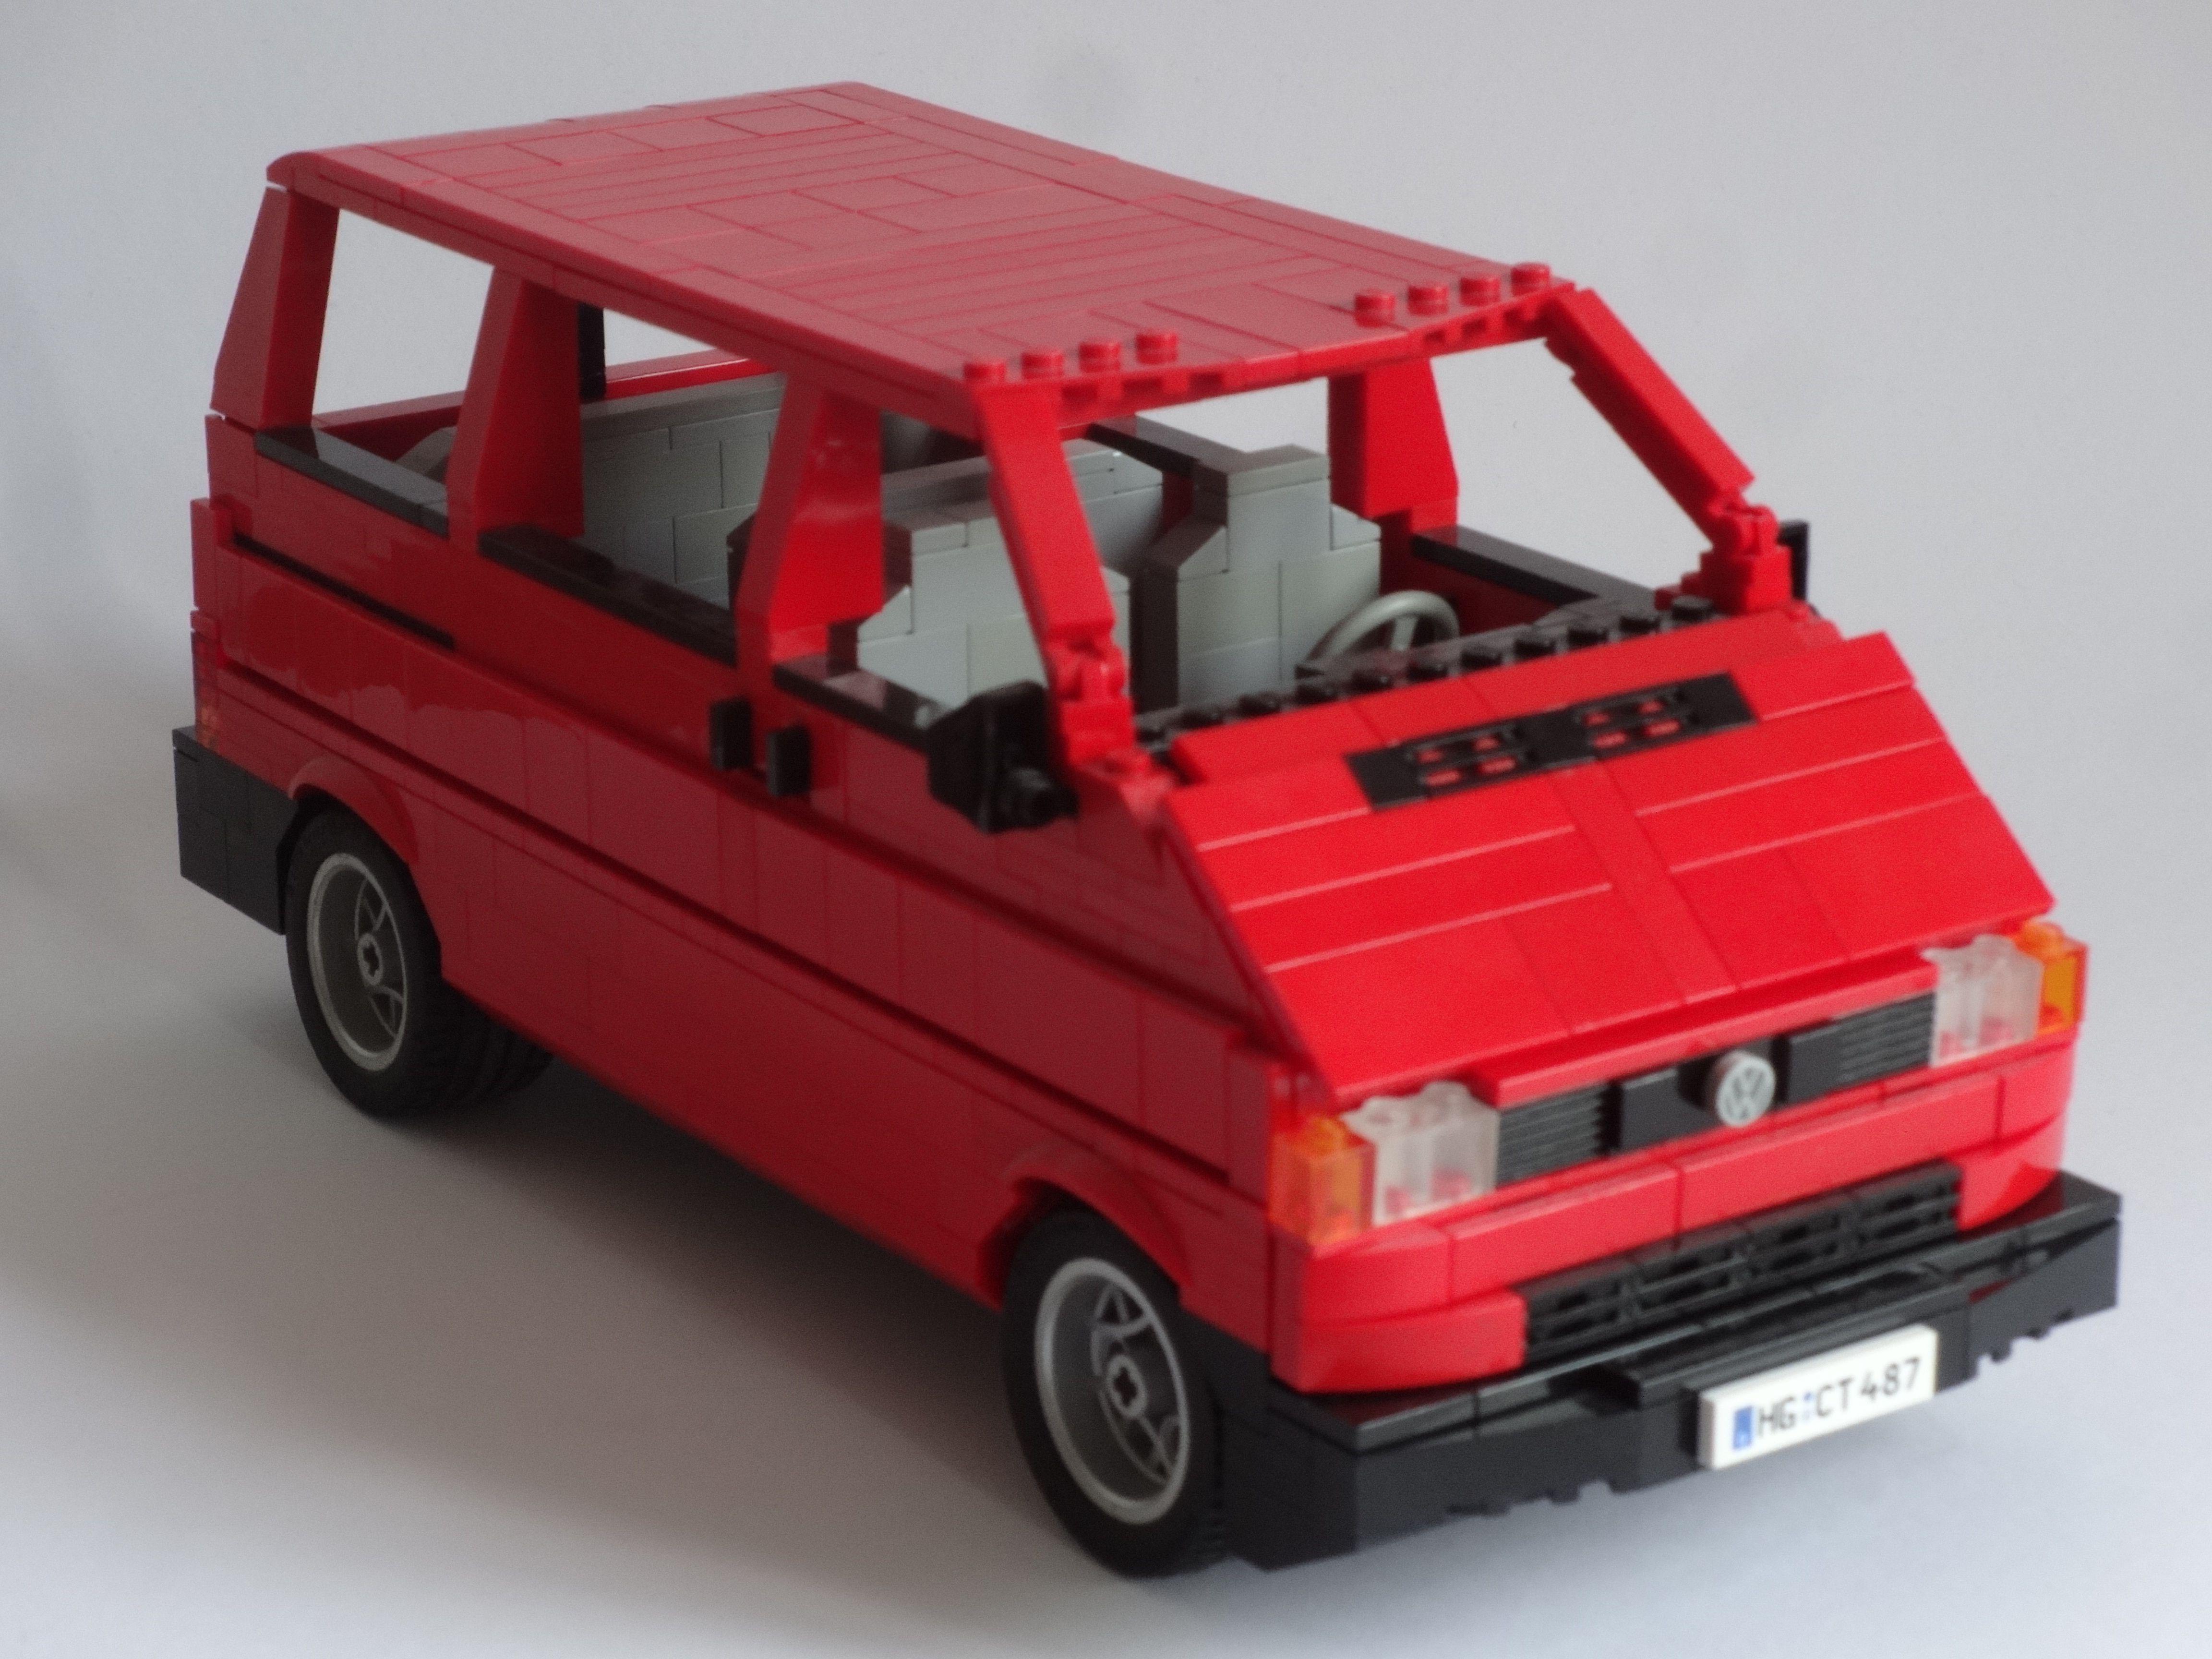 lego vw t4 lego building lego lego toys und lego models. Black Bedroom Furniture Sets. Home Design Ideas